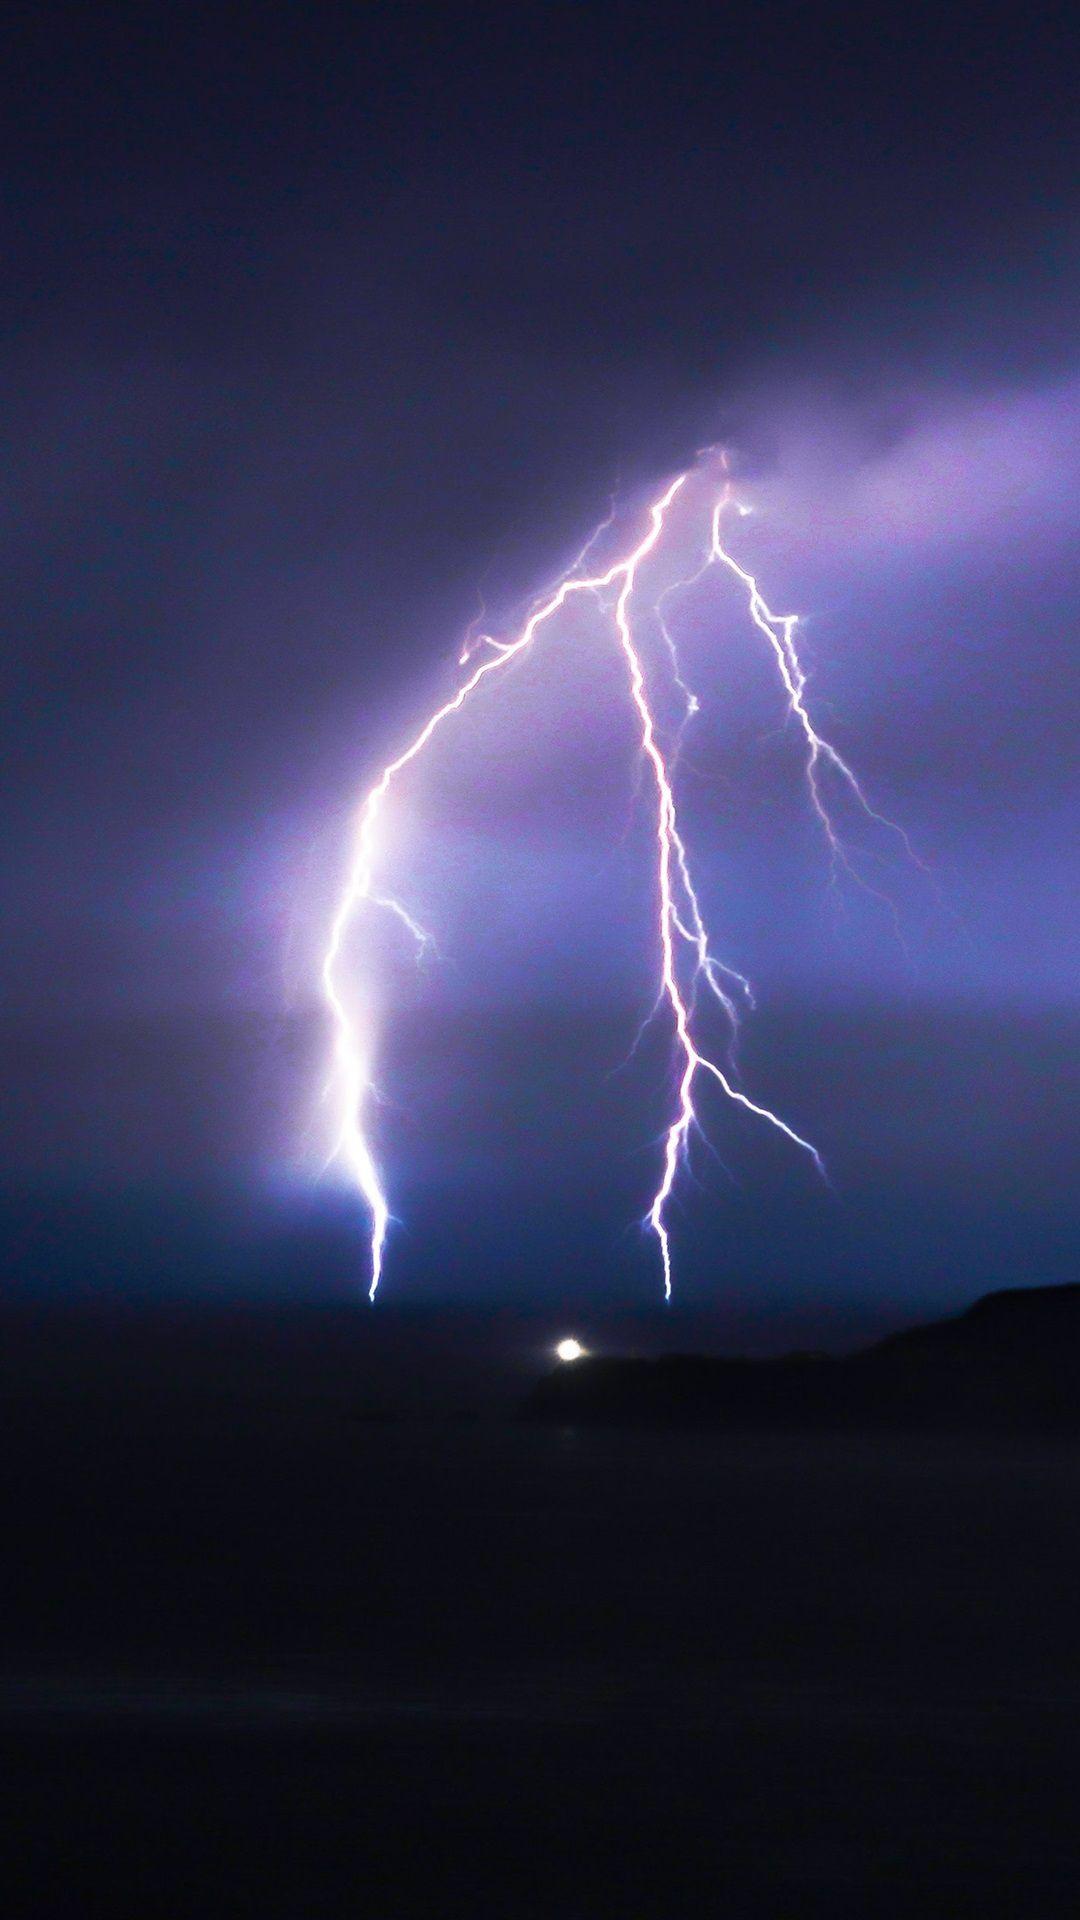 Pin By Jennifer Swisher Augustine On Lightning 3 Lightning Storm Thunder And Lightning Lightning Photos